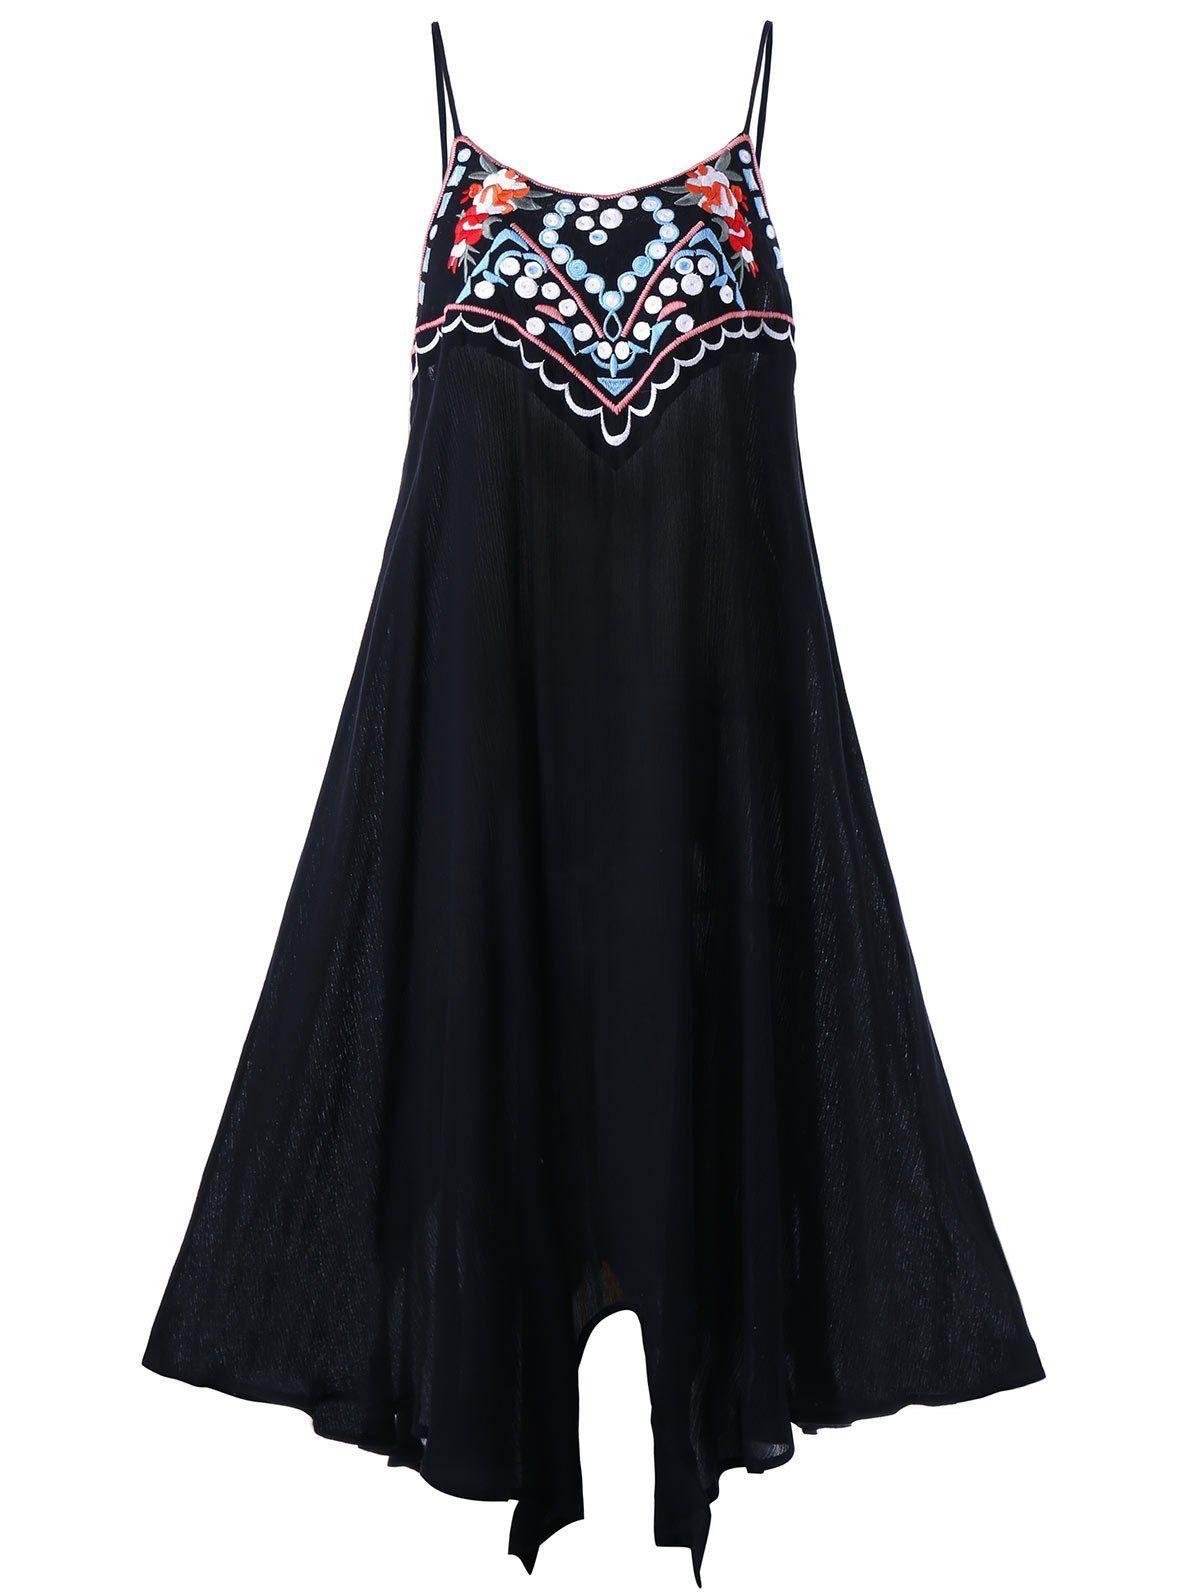 Plus size embroidery slip summer dress in black xl sammydress